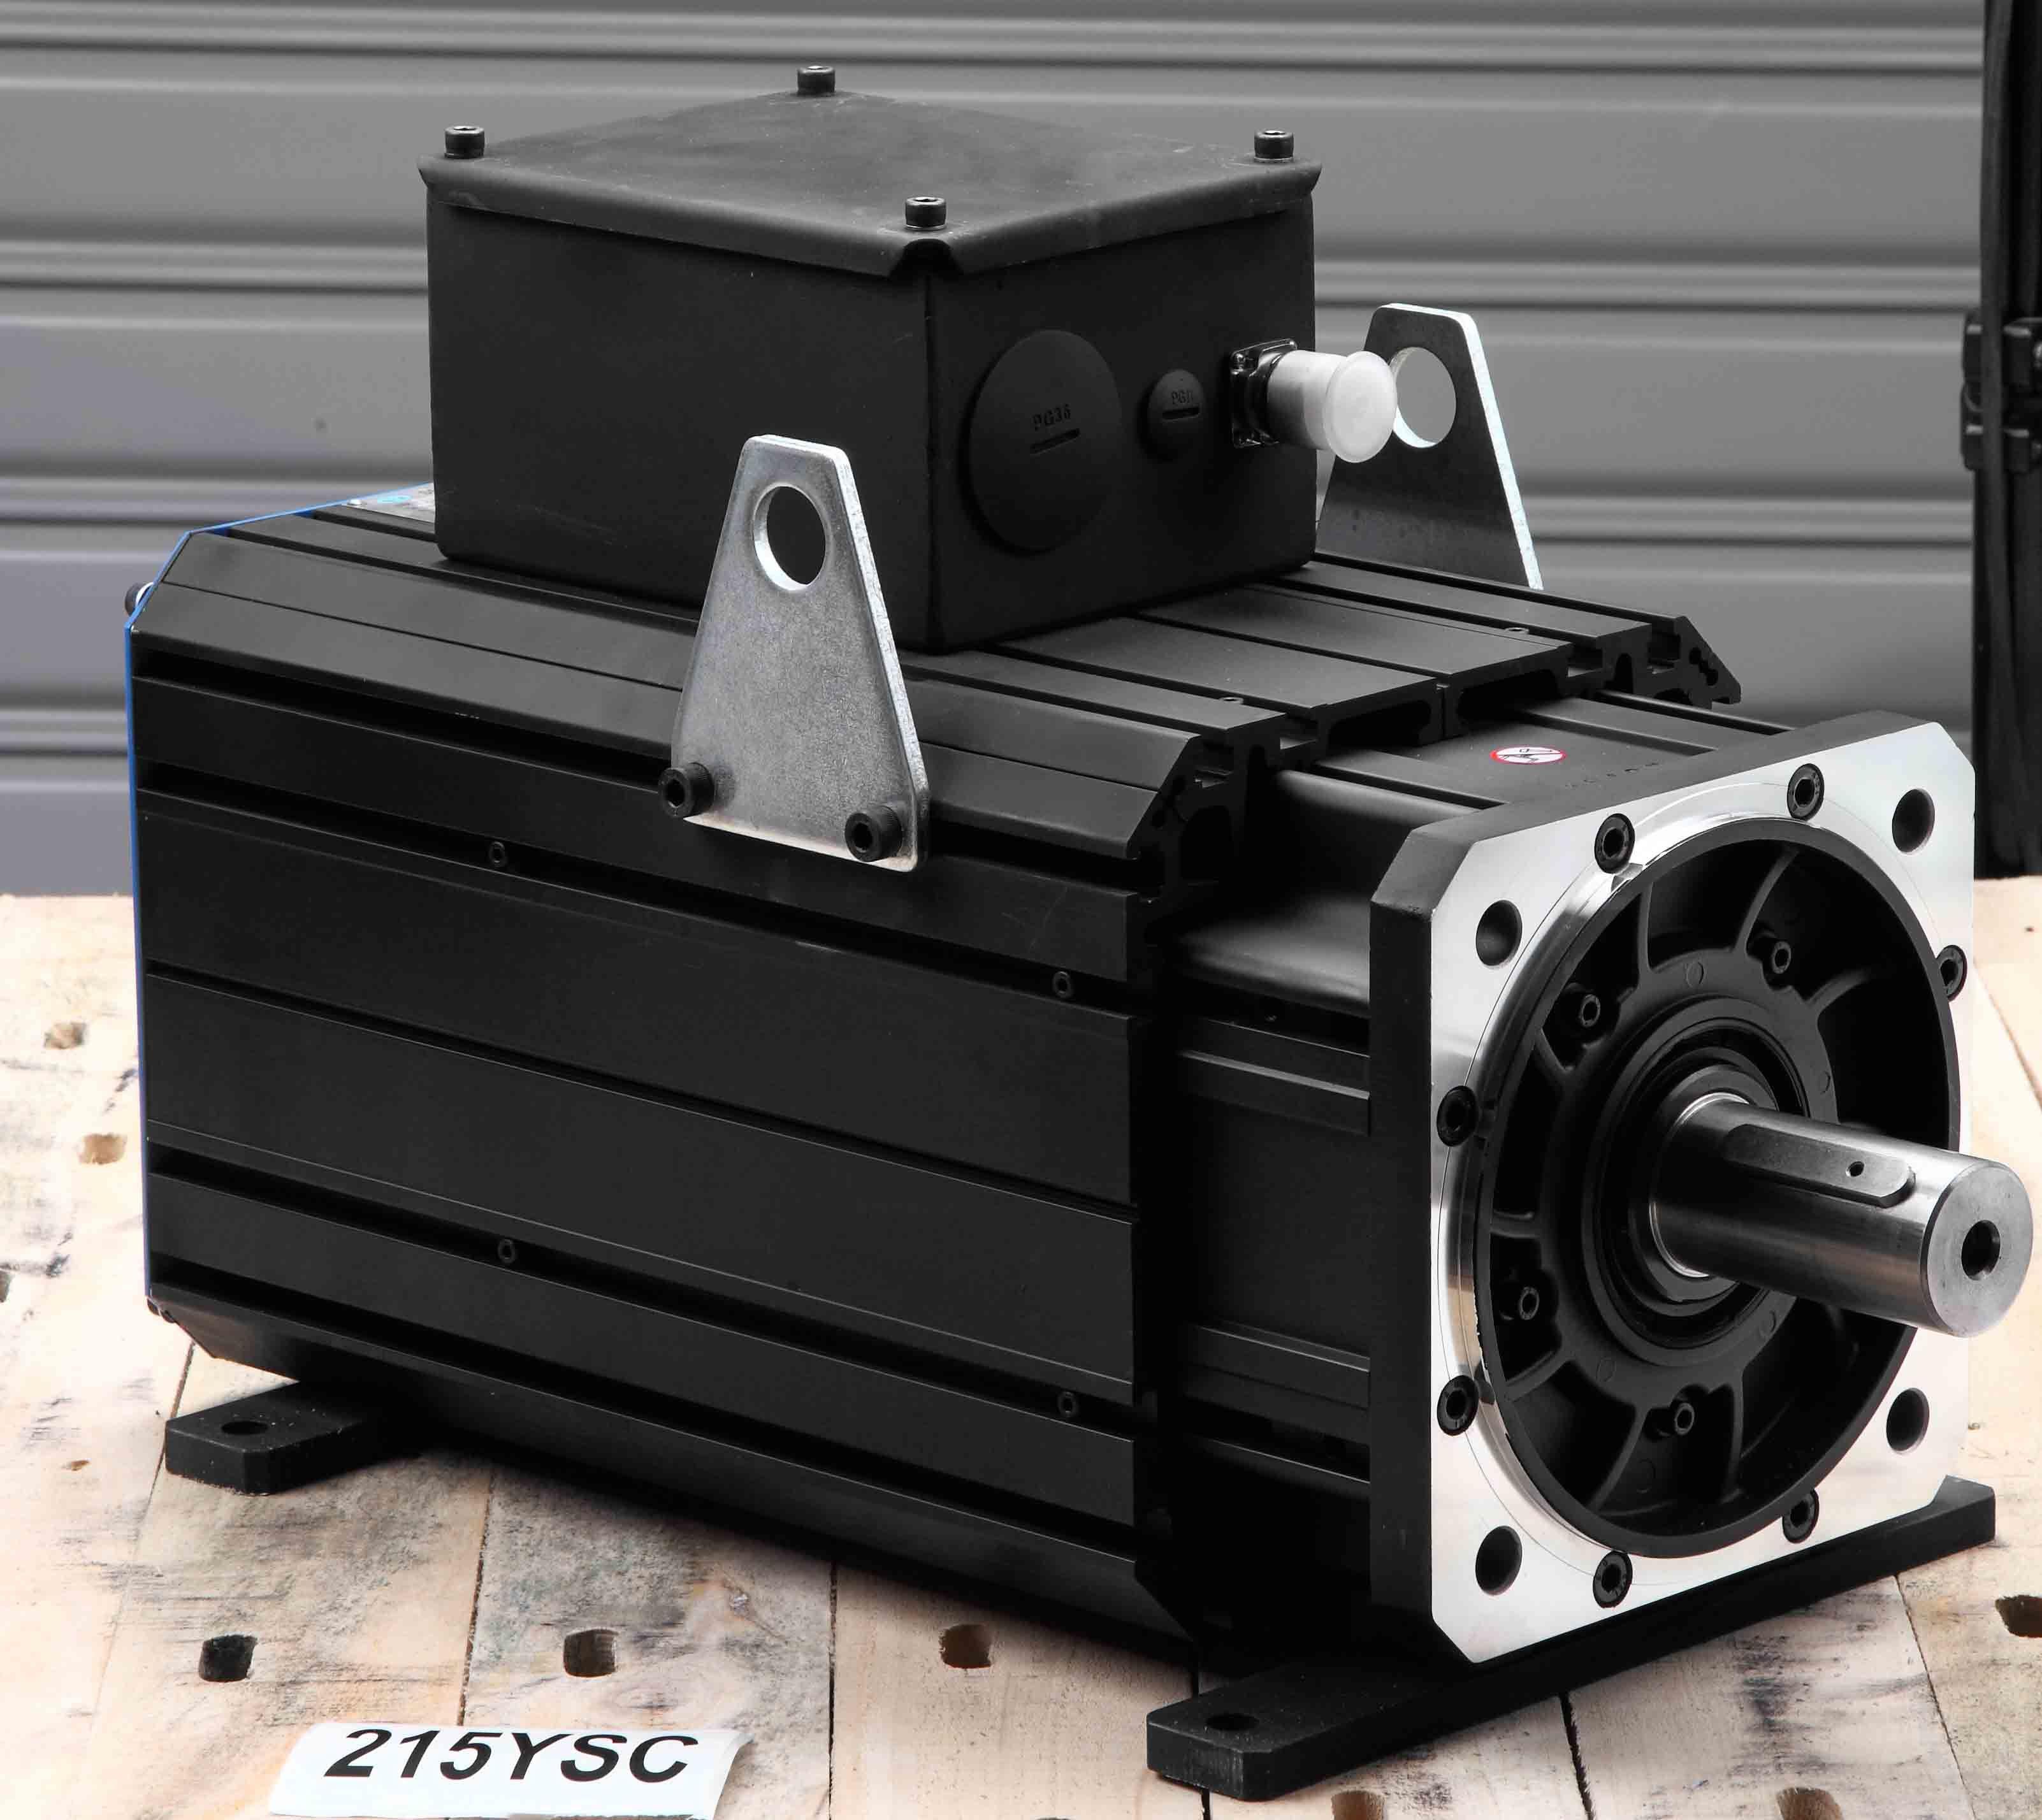 AC Permanent Magnet Servo Motor (215ysc20f 105nm 2000rpm)